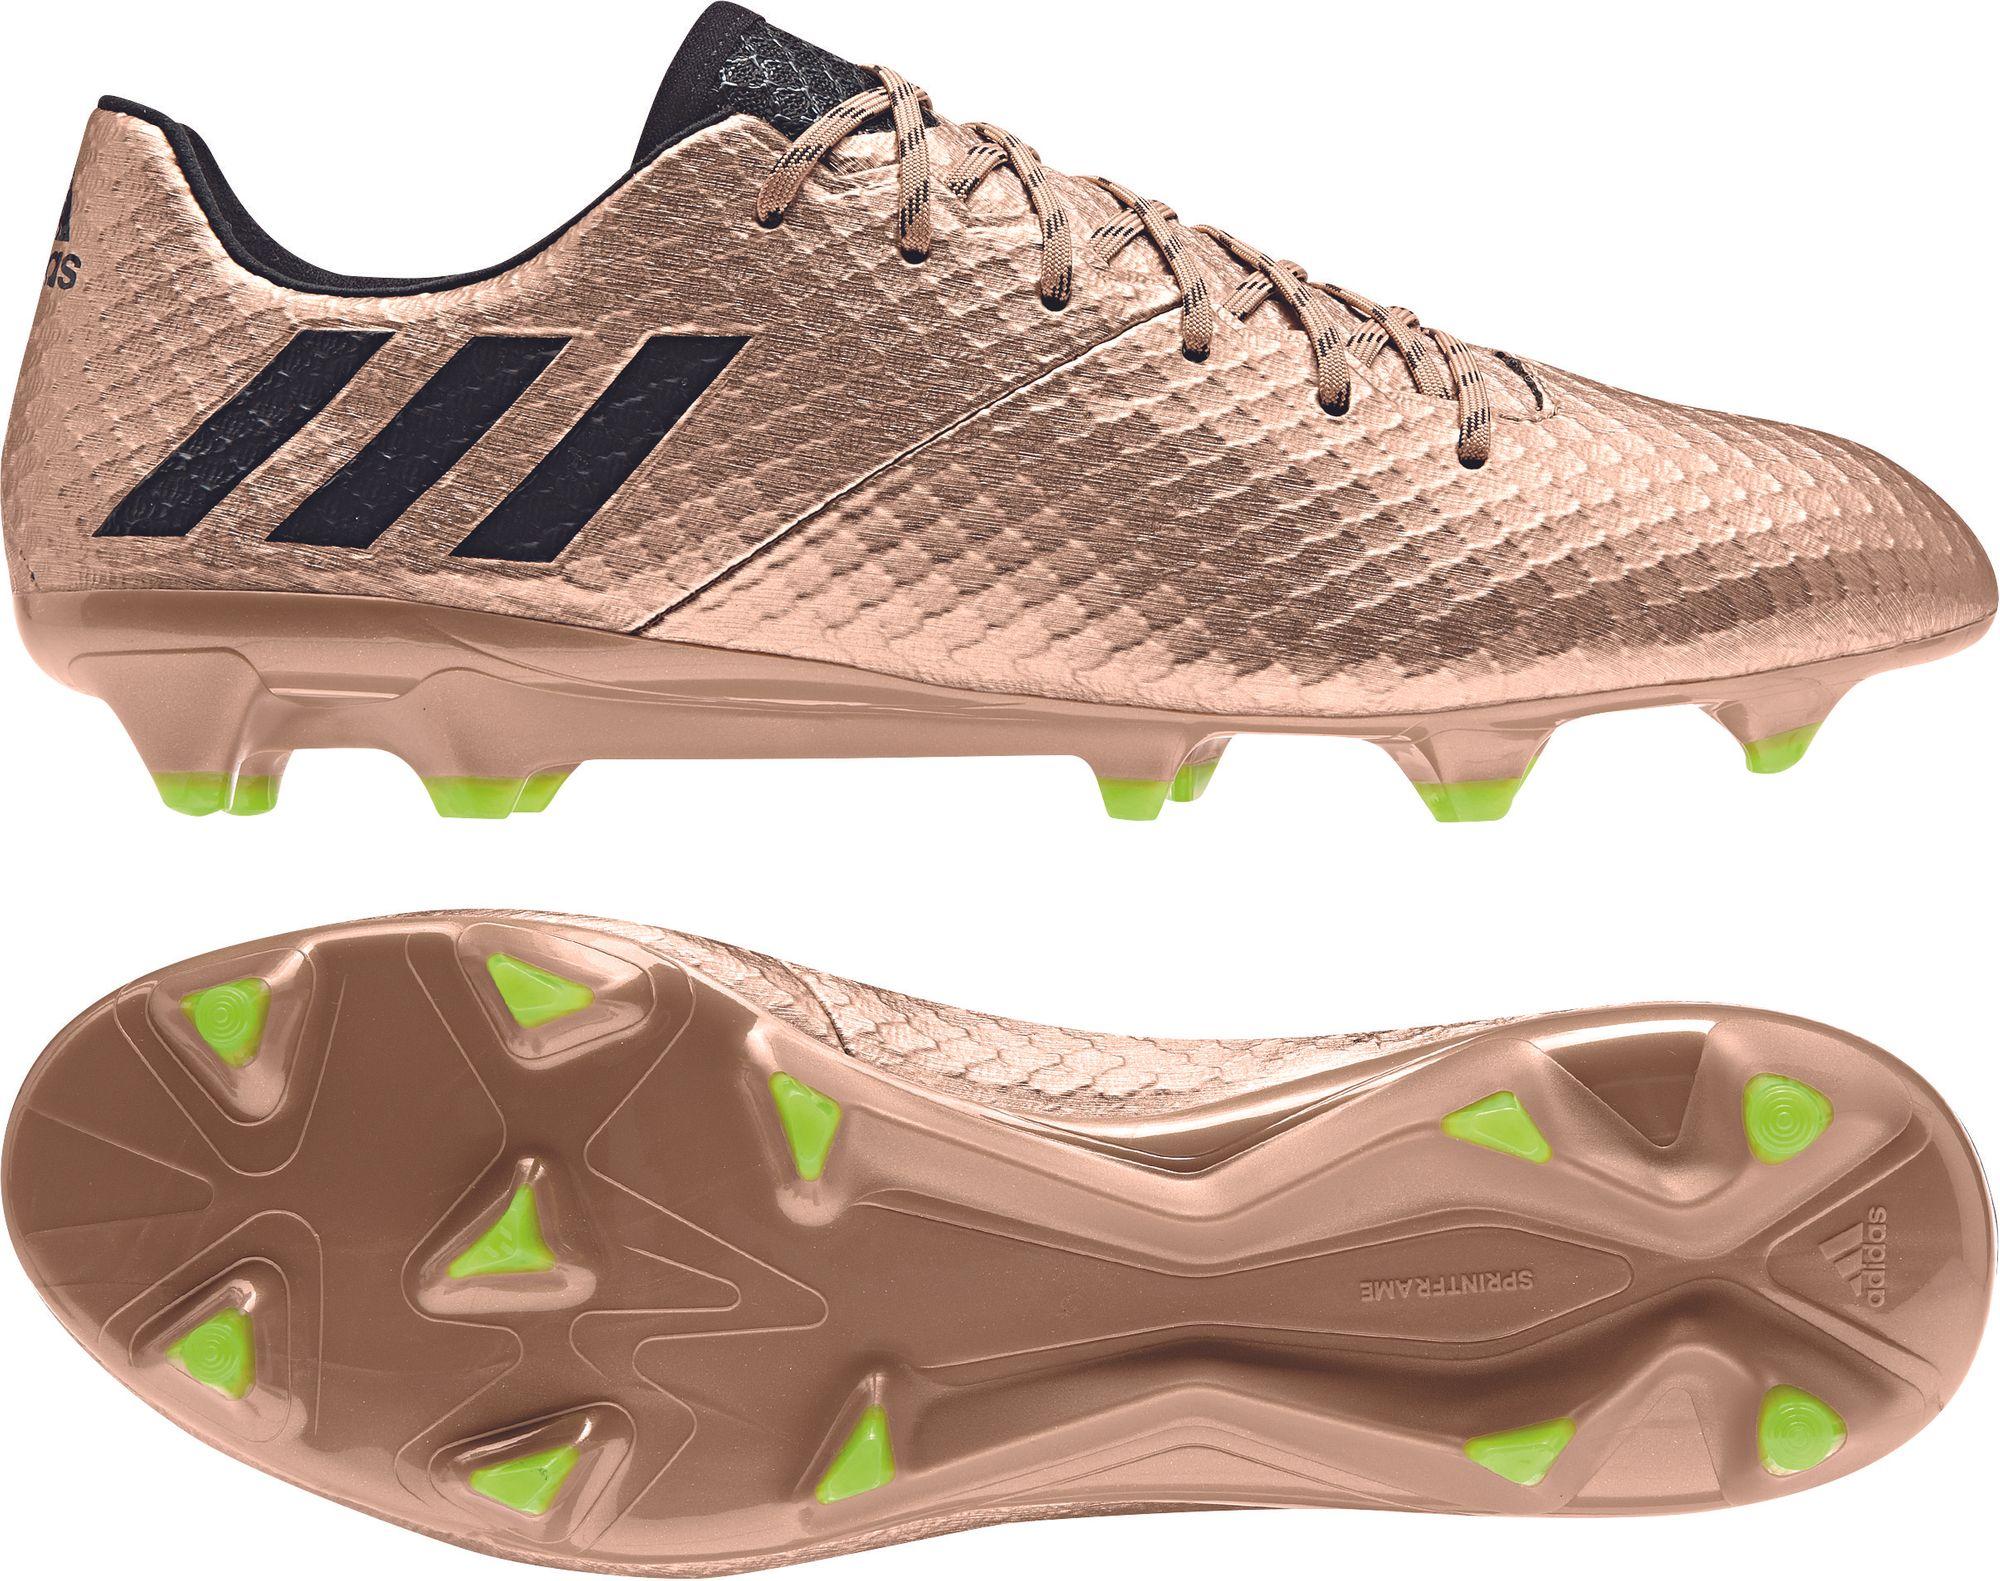 Fußballschuhe Adidas Schuhe Fg Messi Bronze 1 16 IbvY6f7gy